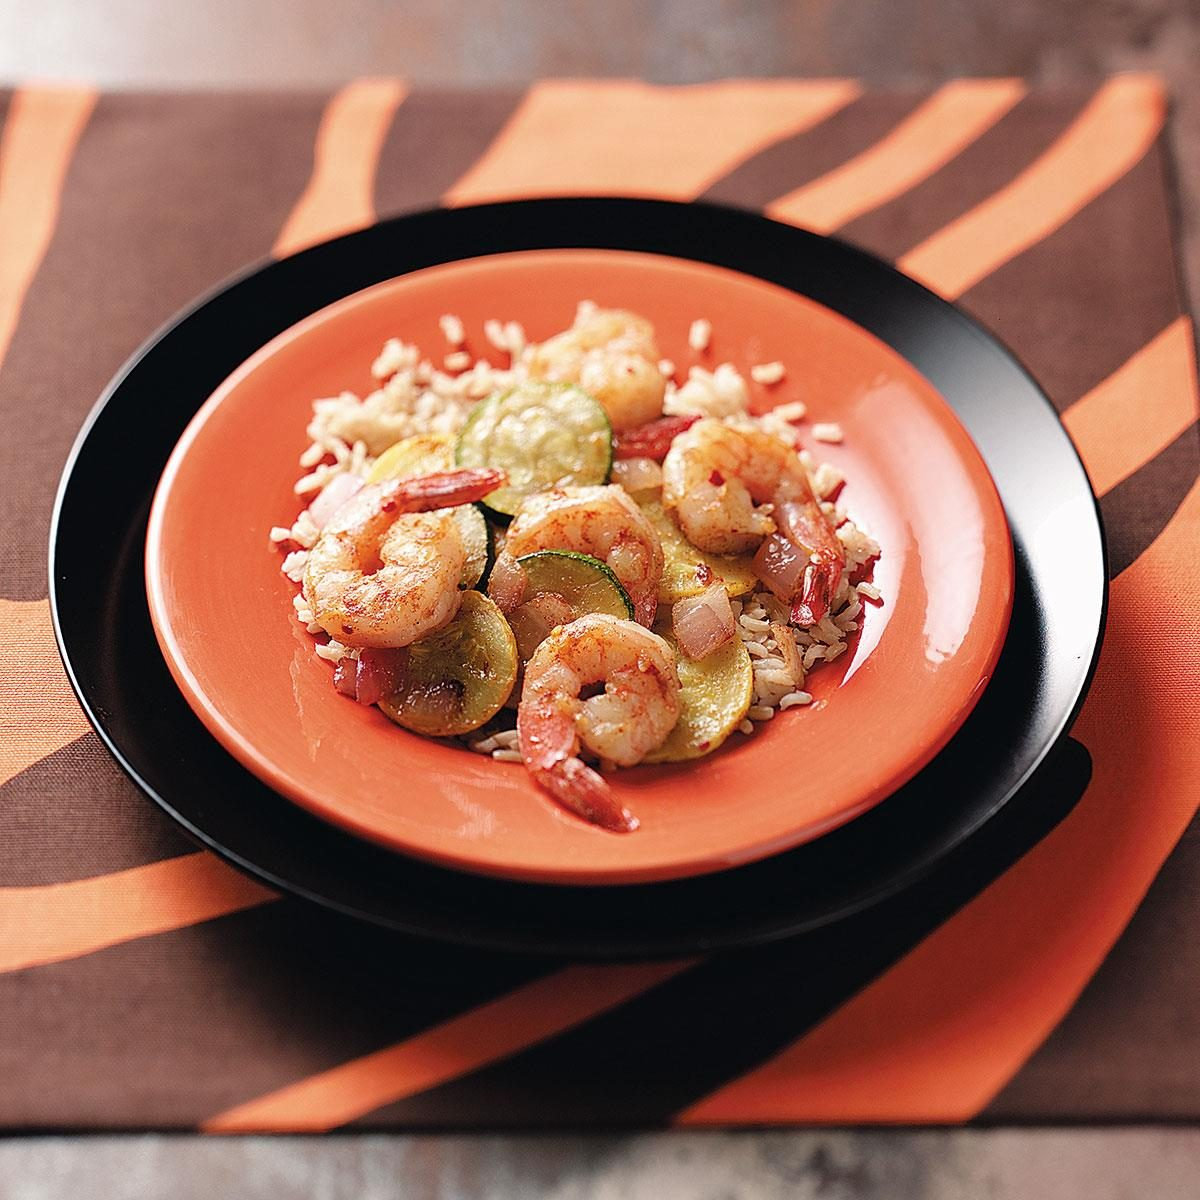 Cajun Shrimp Stir-Fry